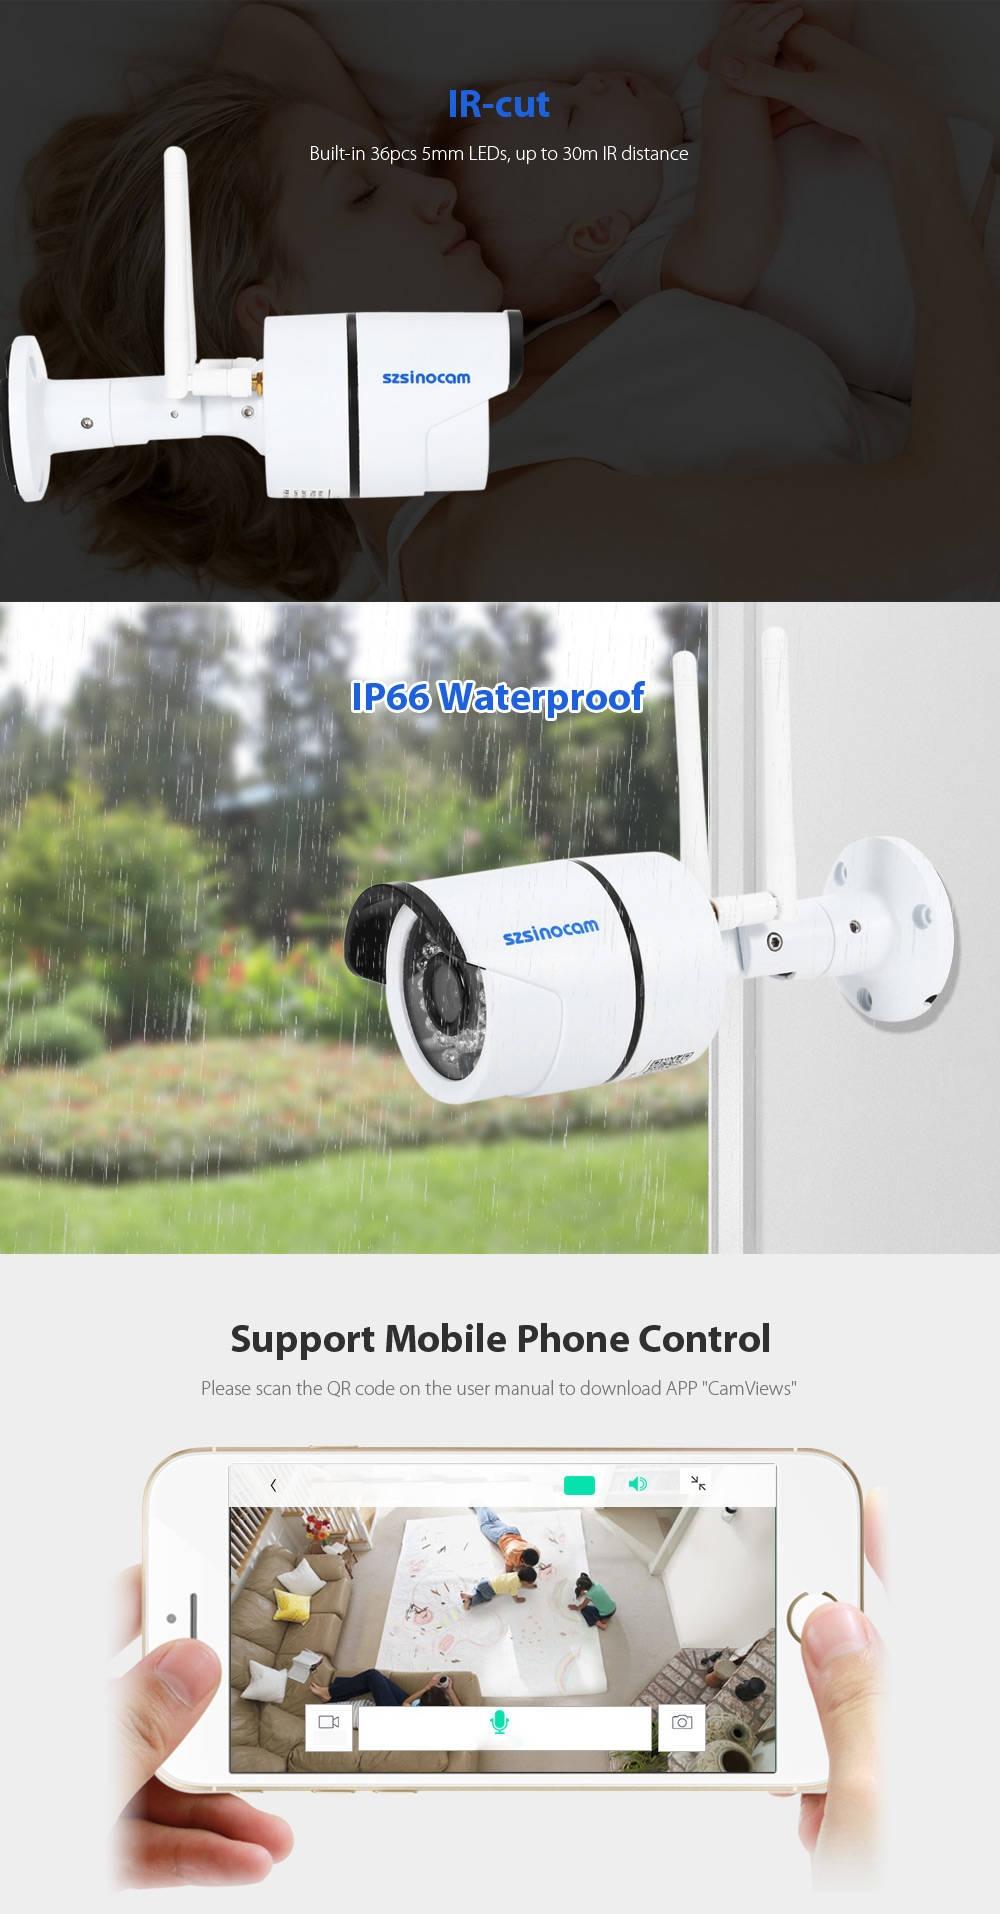 Szsinocam SZ - IPC - 7032SW1.0MP WiFi IP Camera Security System 720P Motion Detection Waterproof